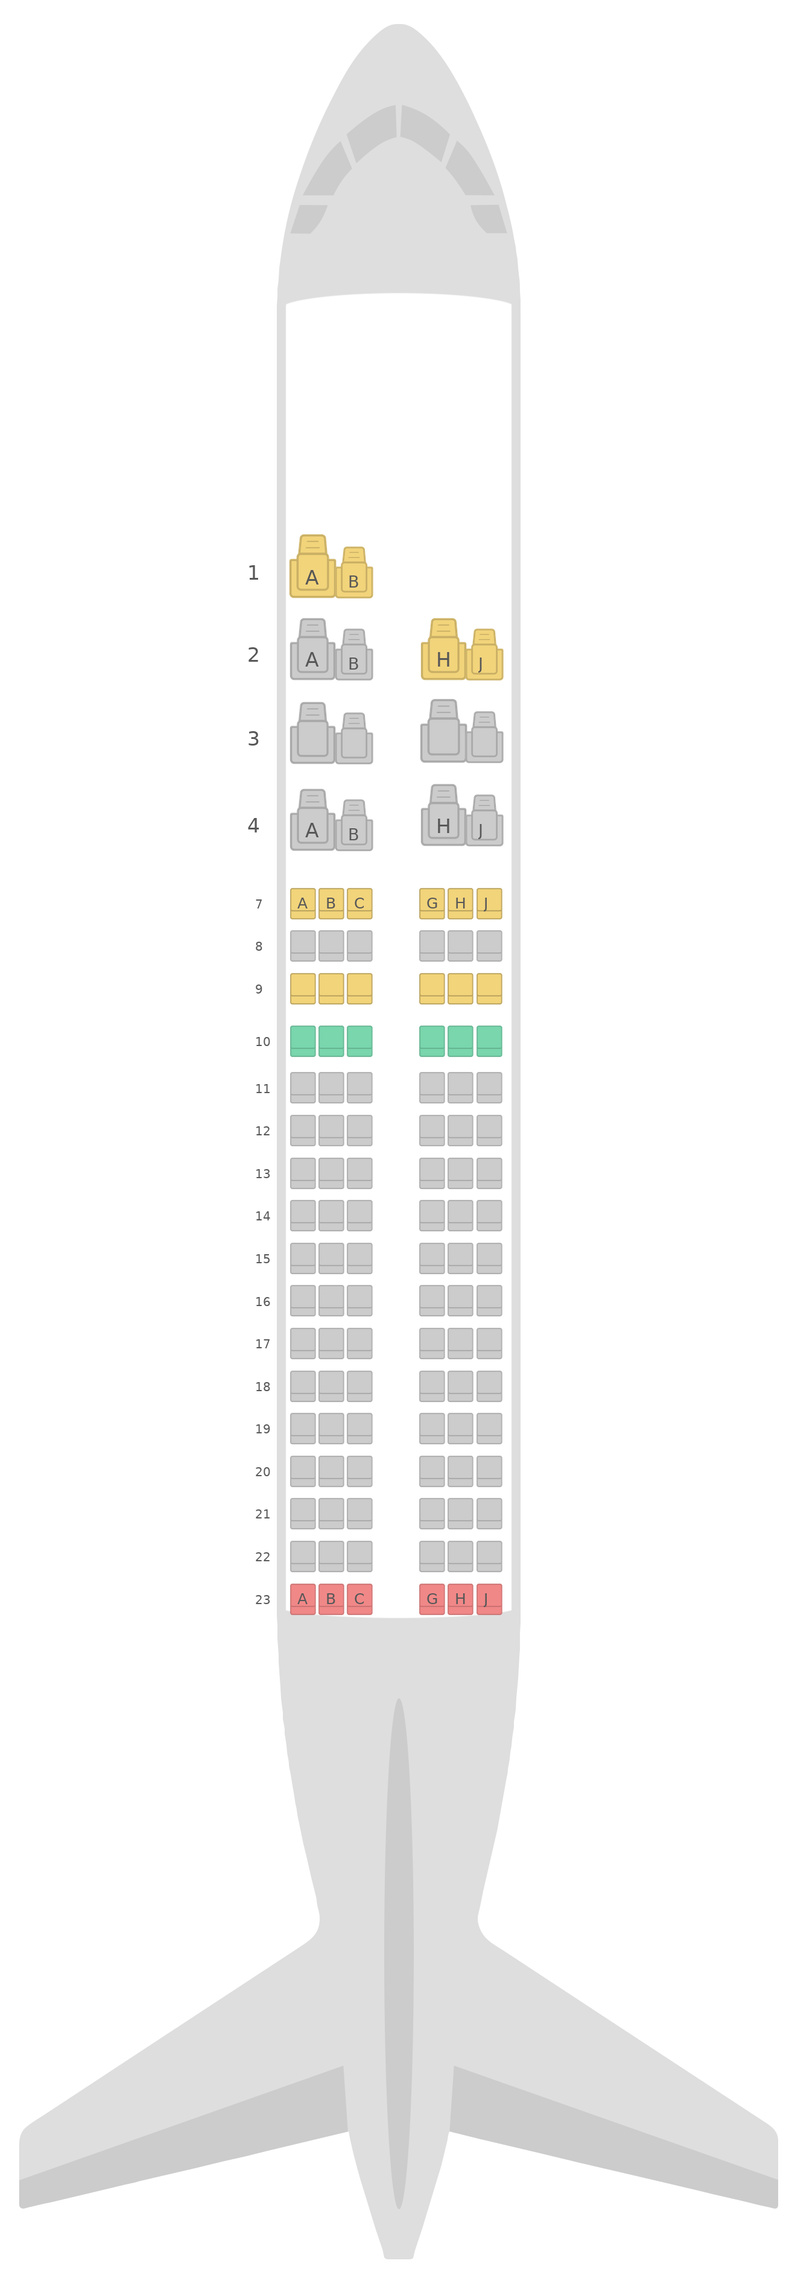 Seat Map Royal Jordanian Airlines Airbus A319